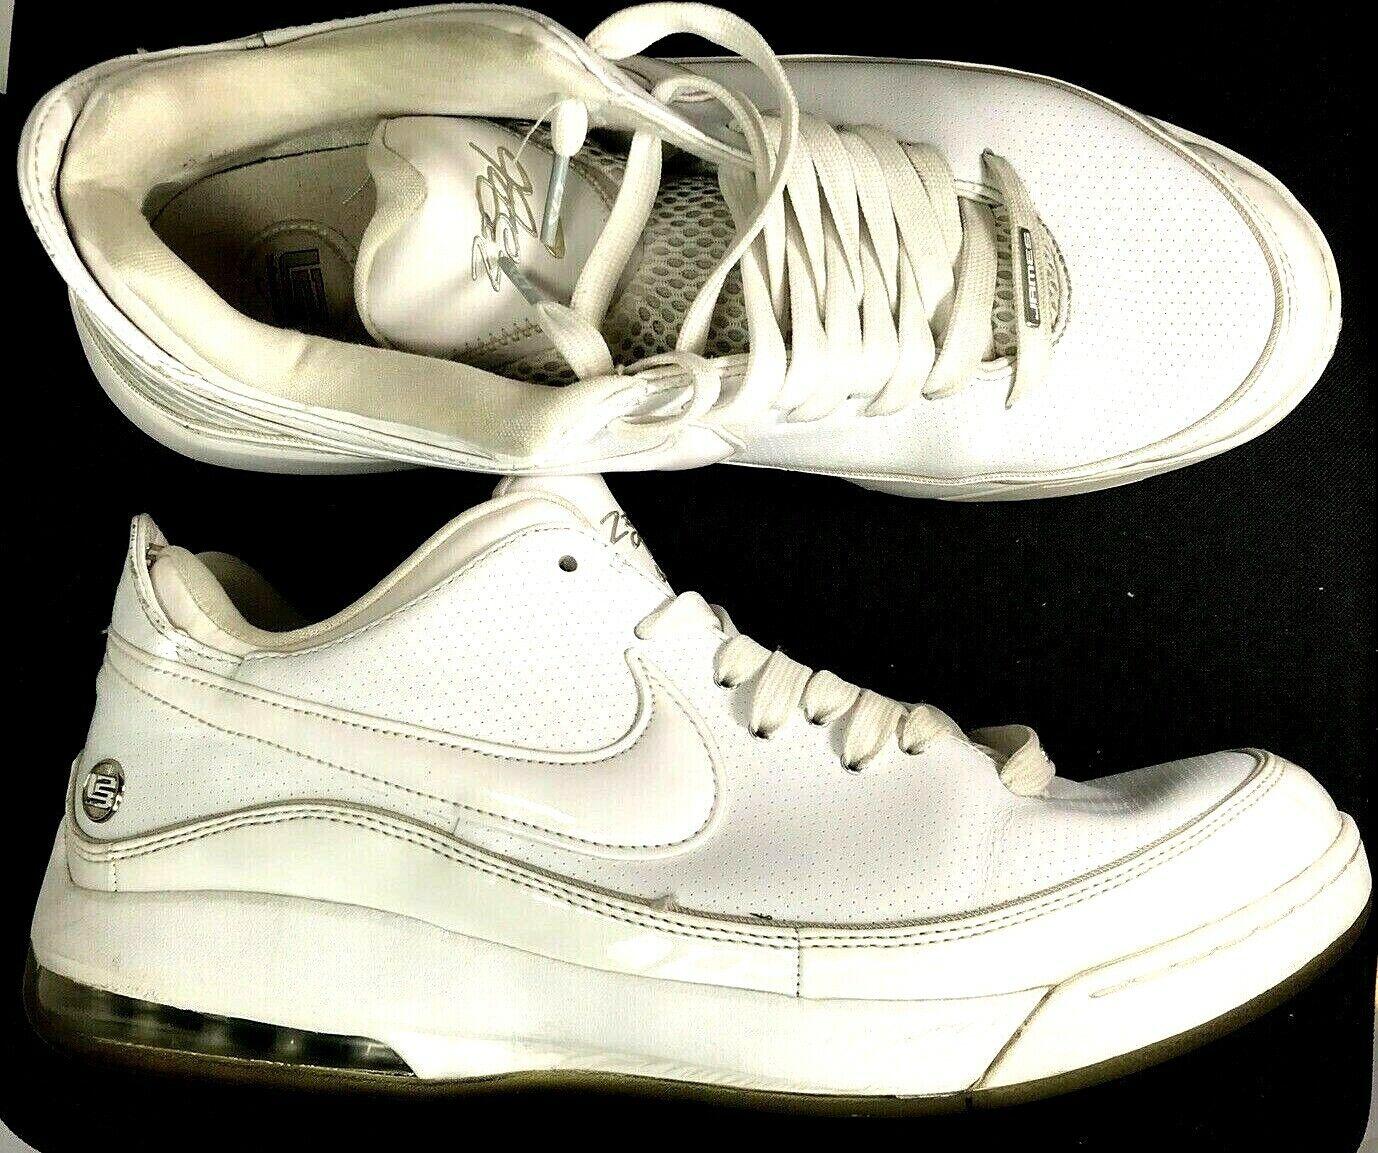 Nike Air Max Lebron James VII Low 09' Mens White Sneaker shoes Sz 13 395717-102